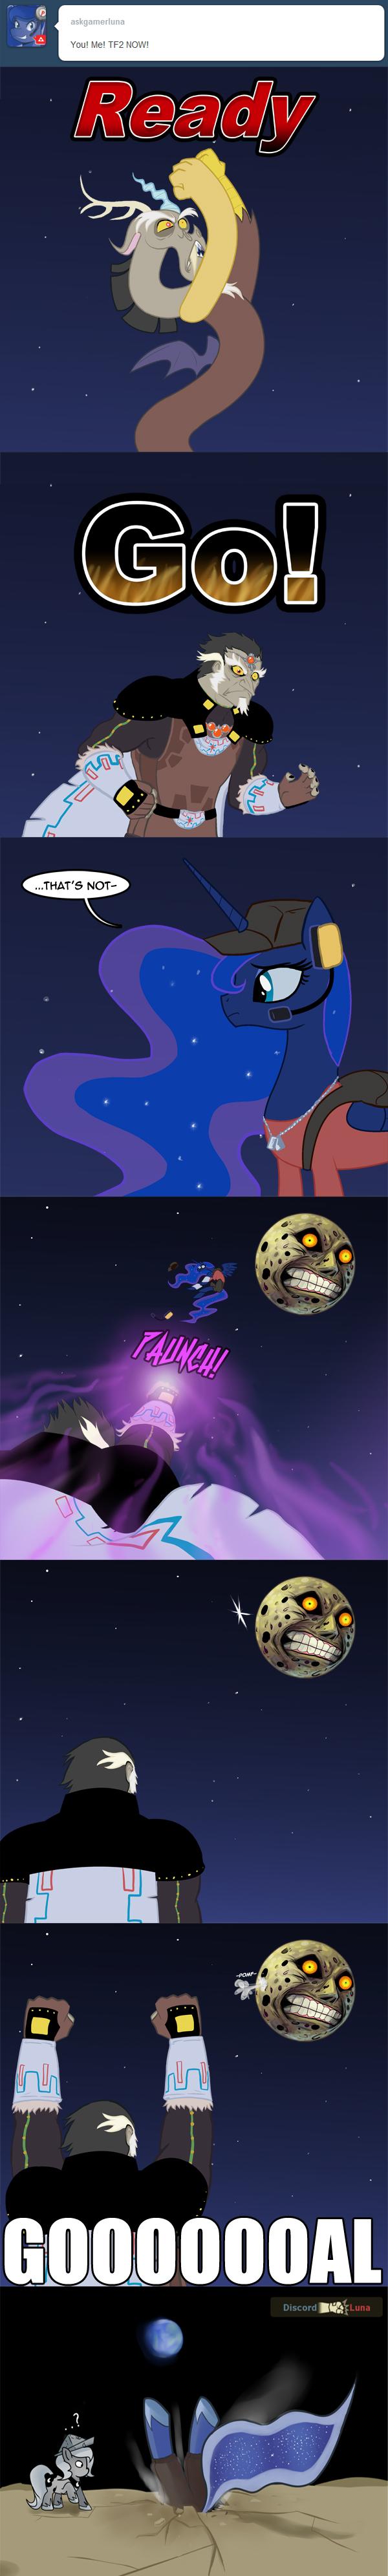 GOOOOOOAL!. source: askgamerluna.tumblr.com.. Now, fight me. MLP tumblr Discord Ganondorf Gamer Luna The moon goal